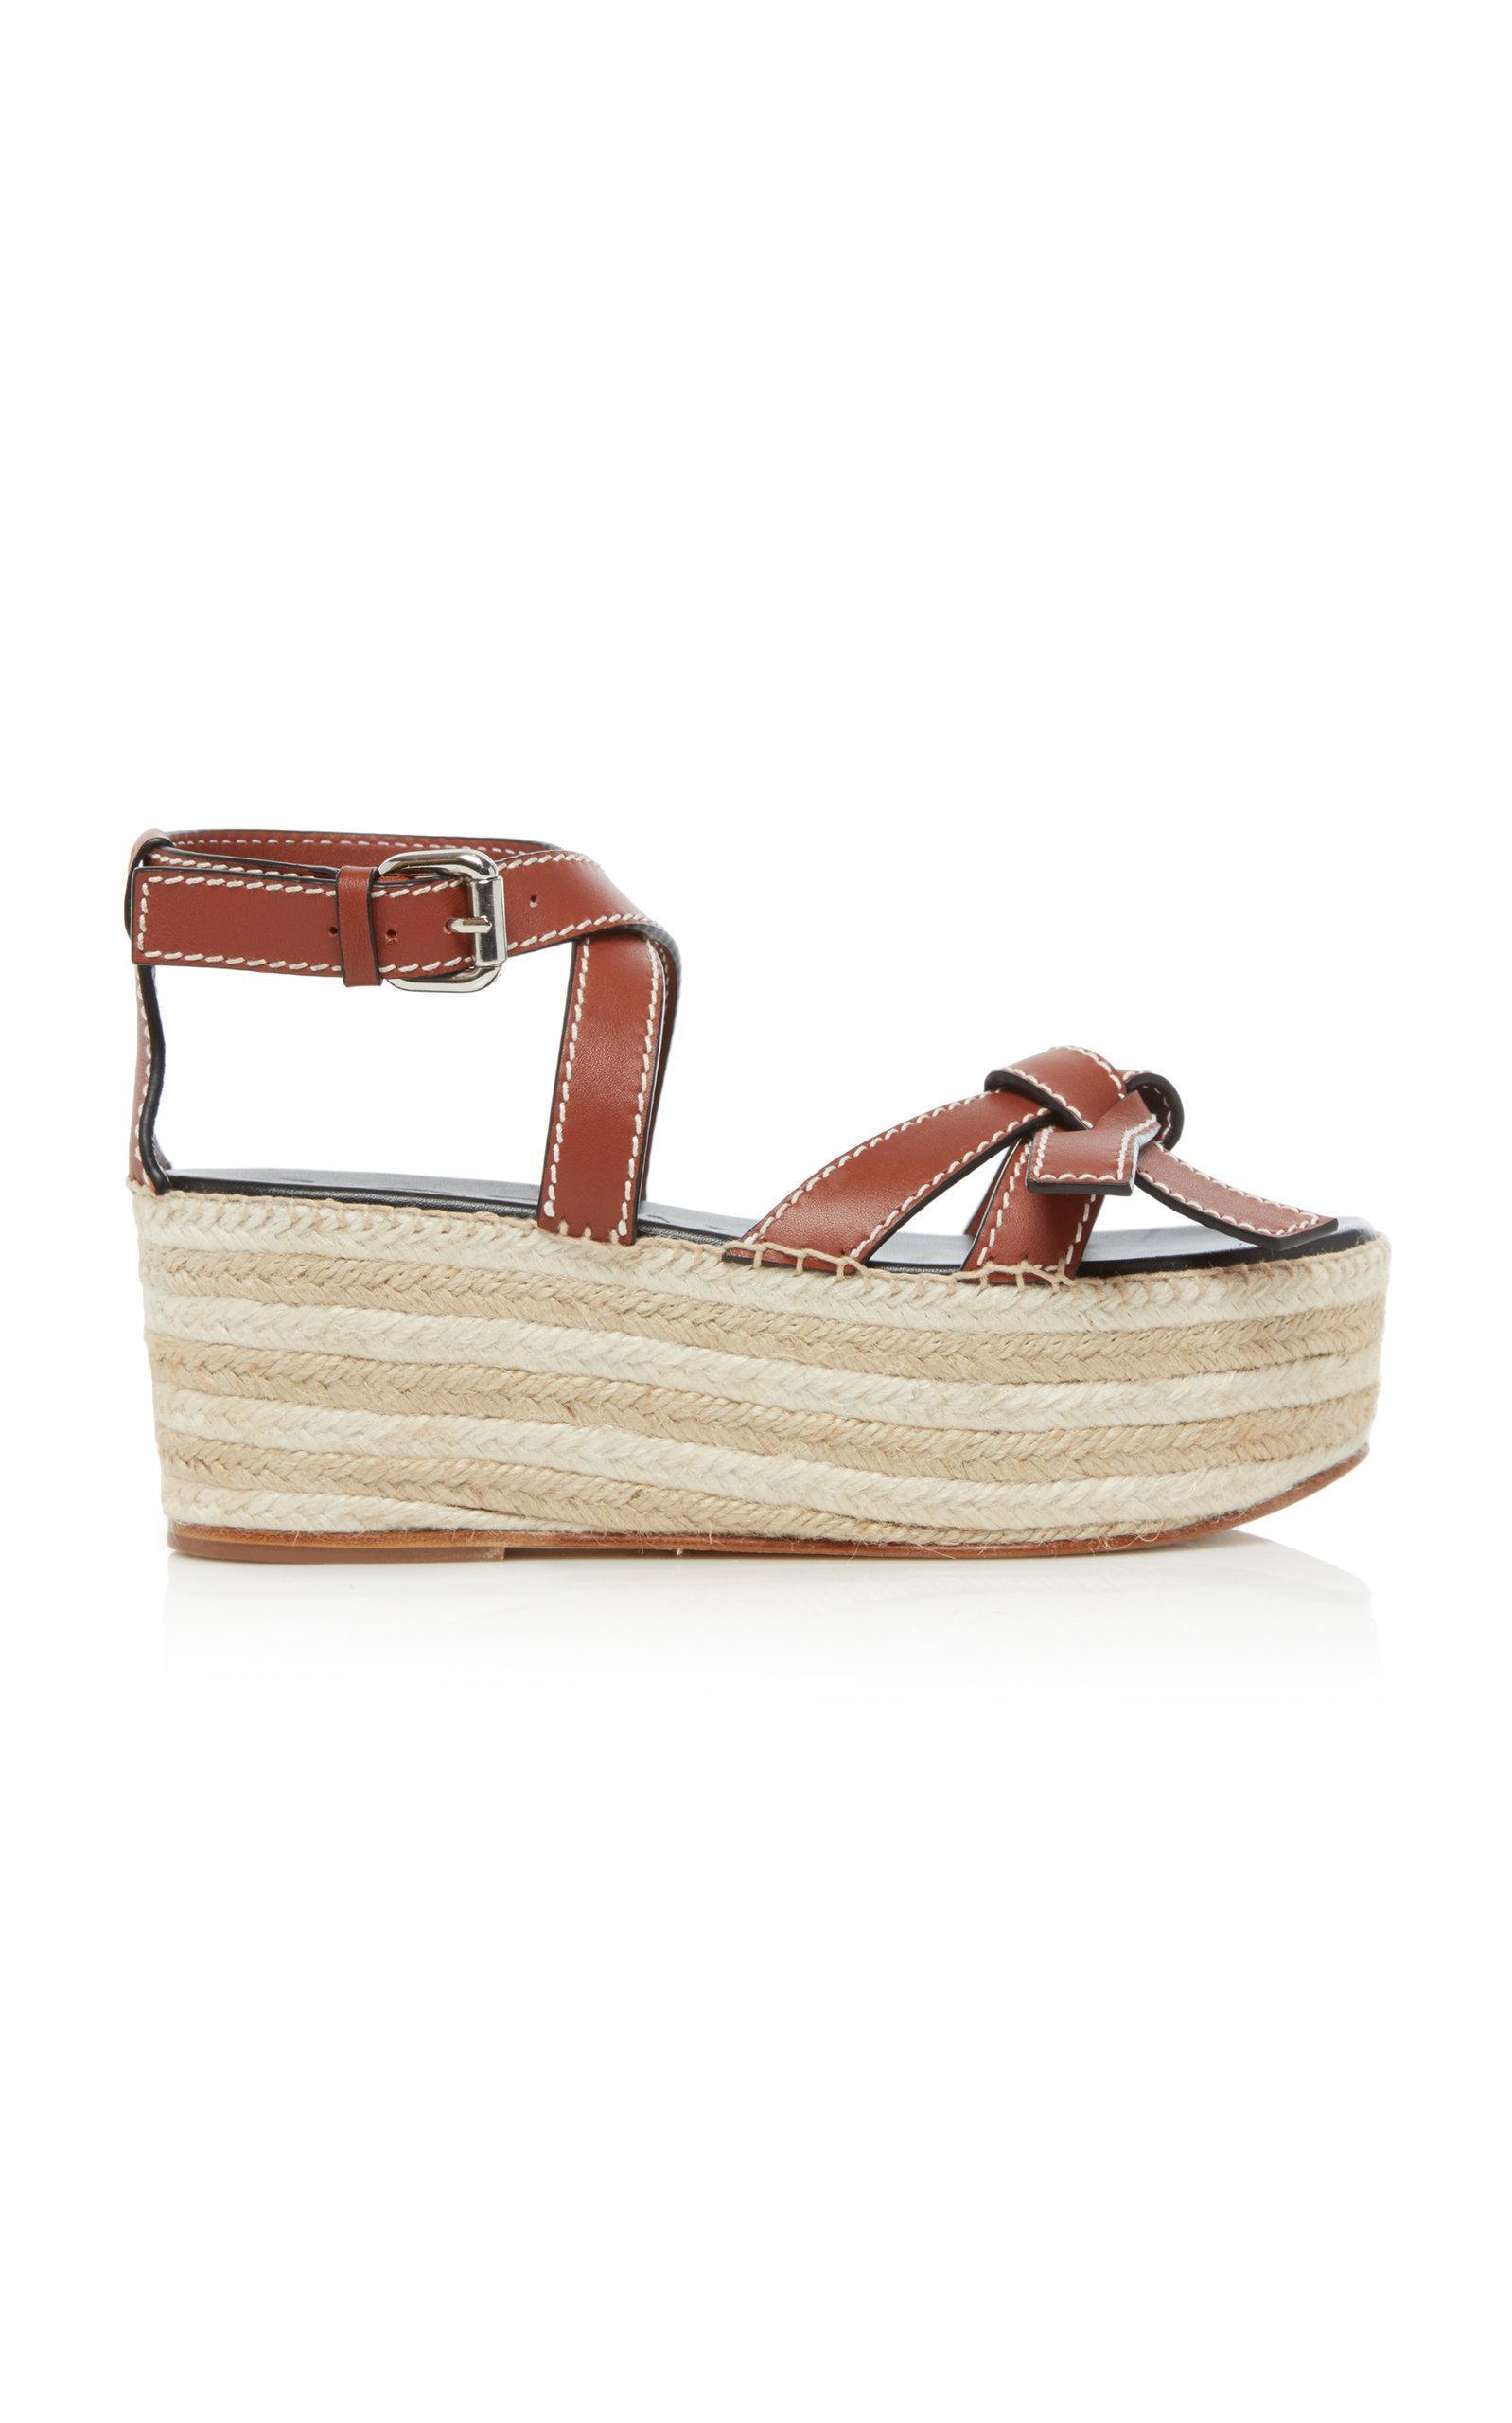 Loewe Gate Topstitched Leather Espadrille Platform Sandals In Brown